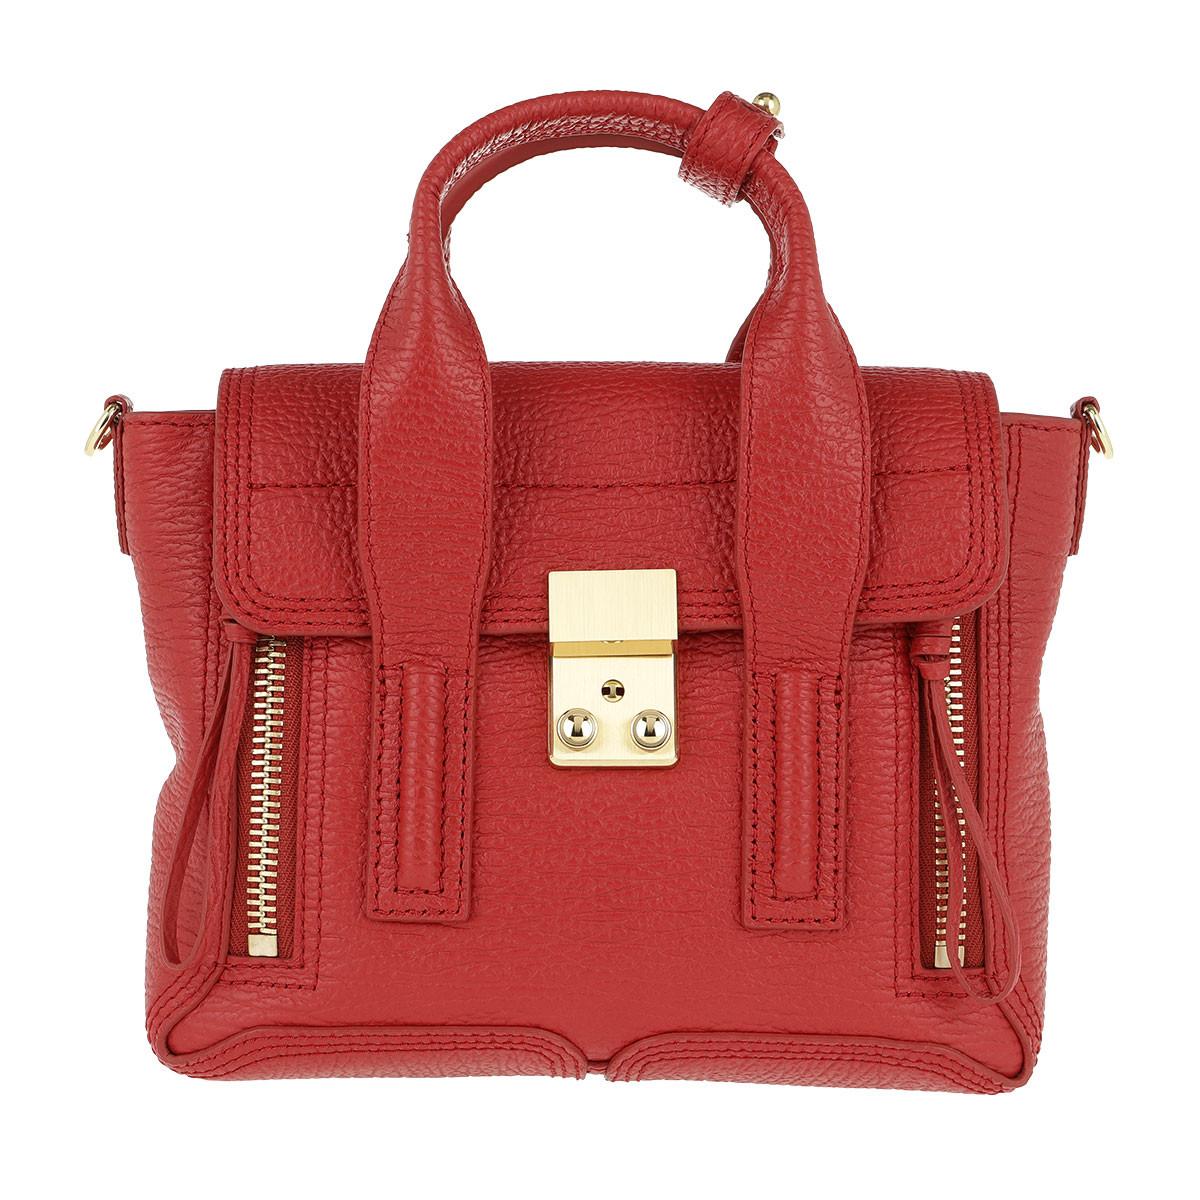 3.1 Phillip Lim Satchel Bag - Pashli Mini Satchel Red - in rot - für Damen